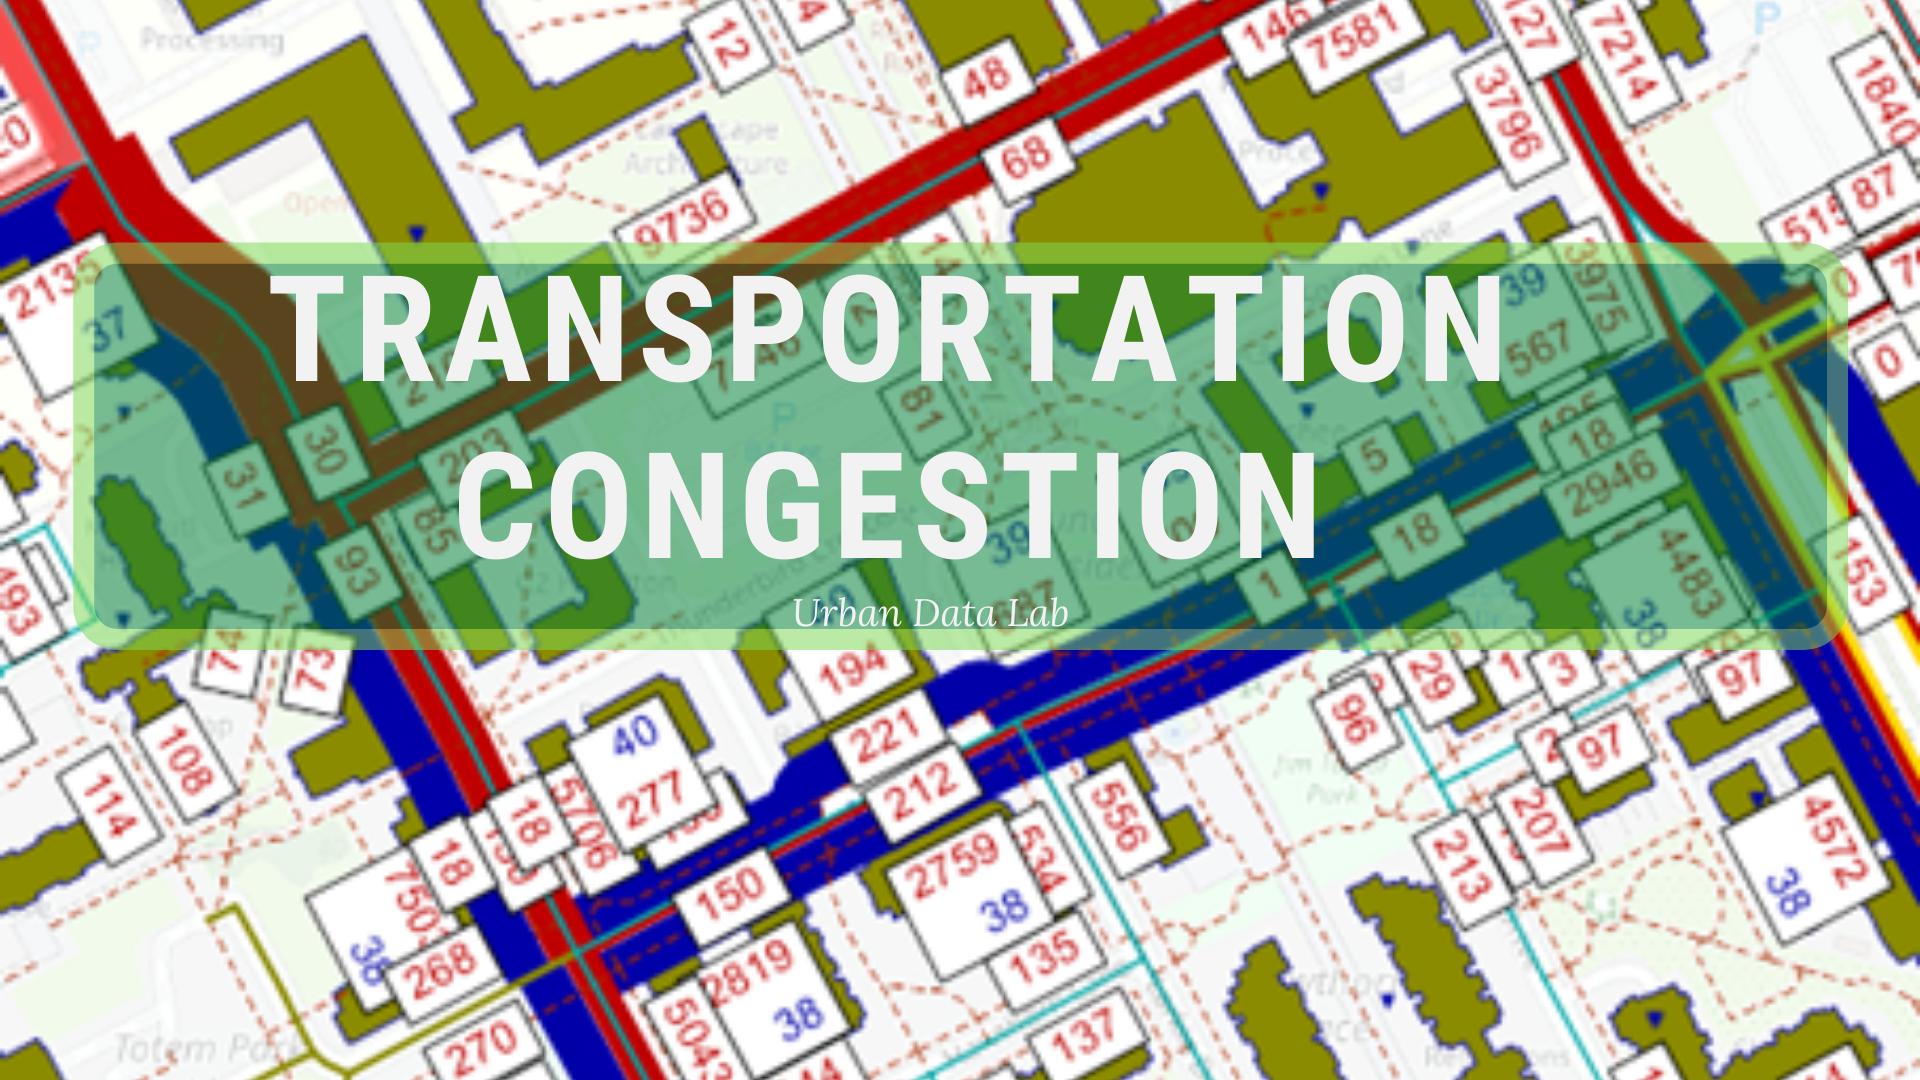 UBC's multi-modal transportation systems